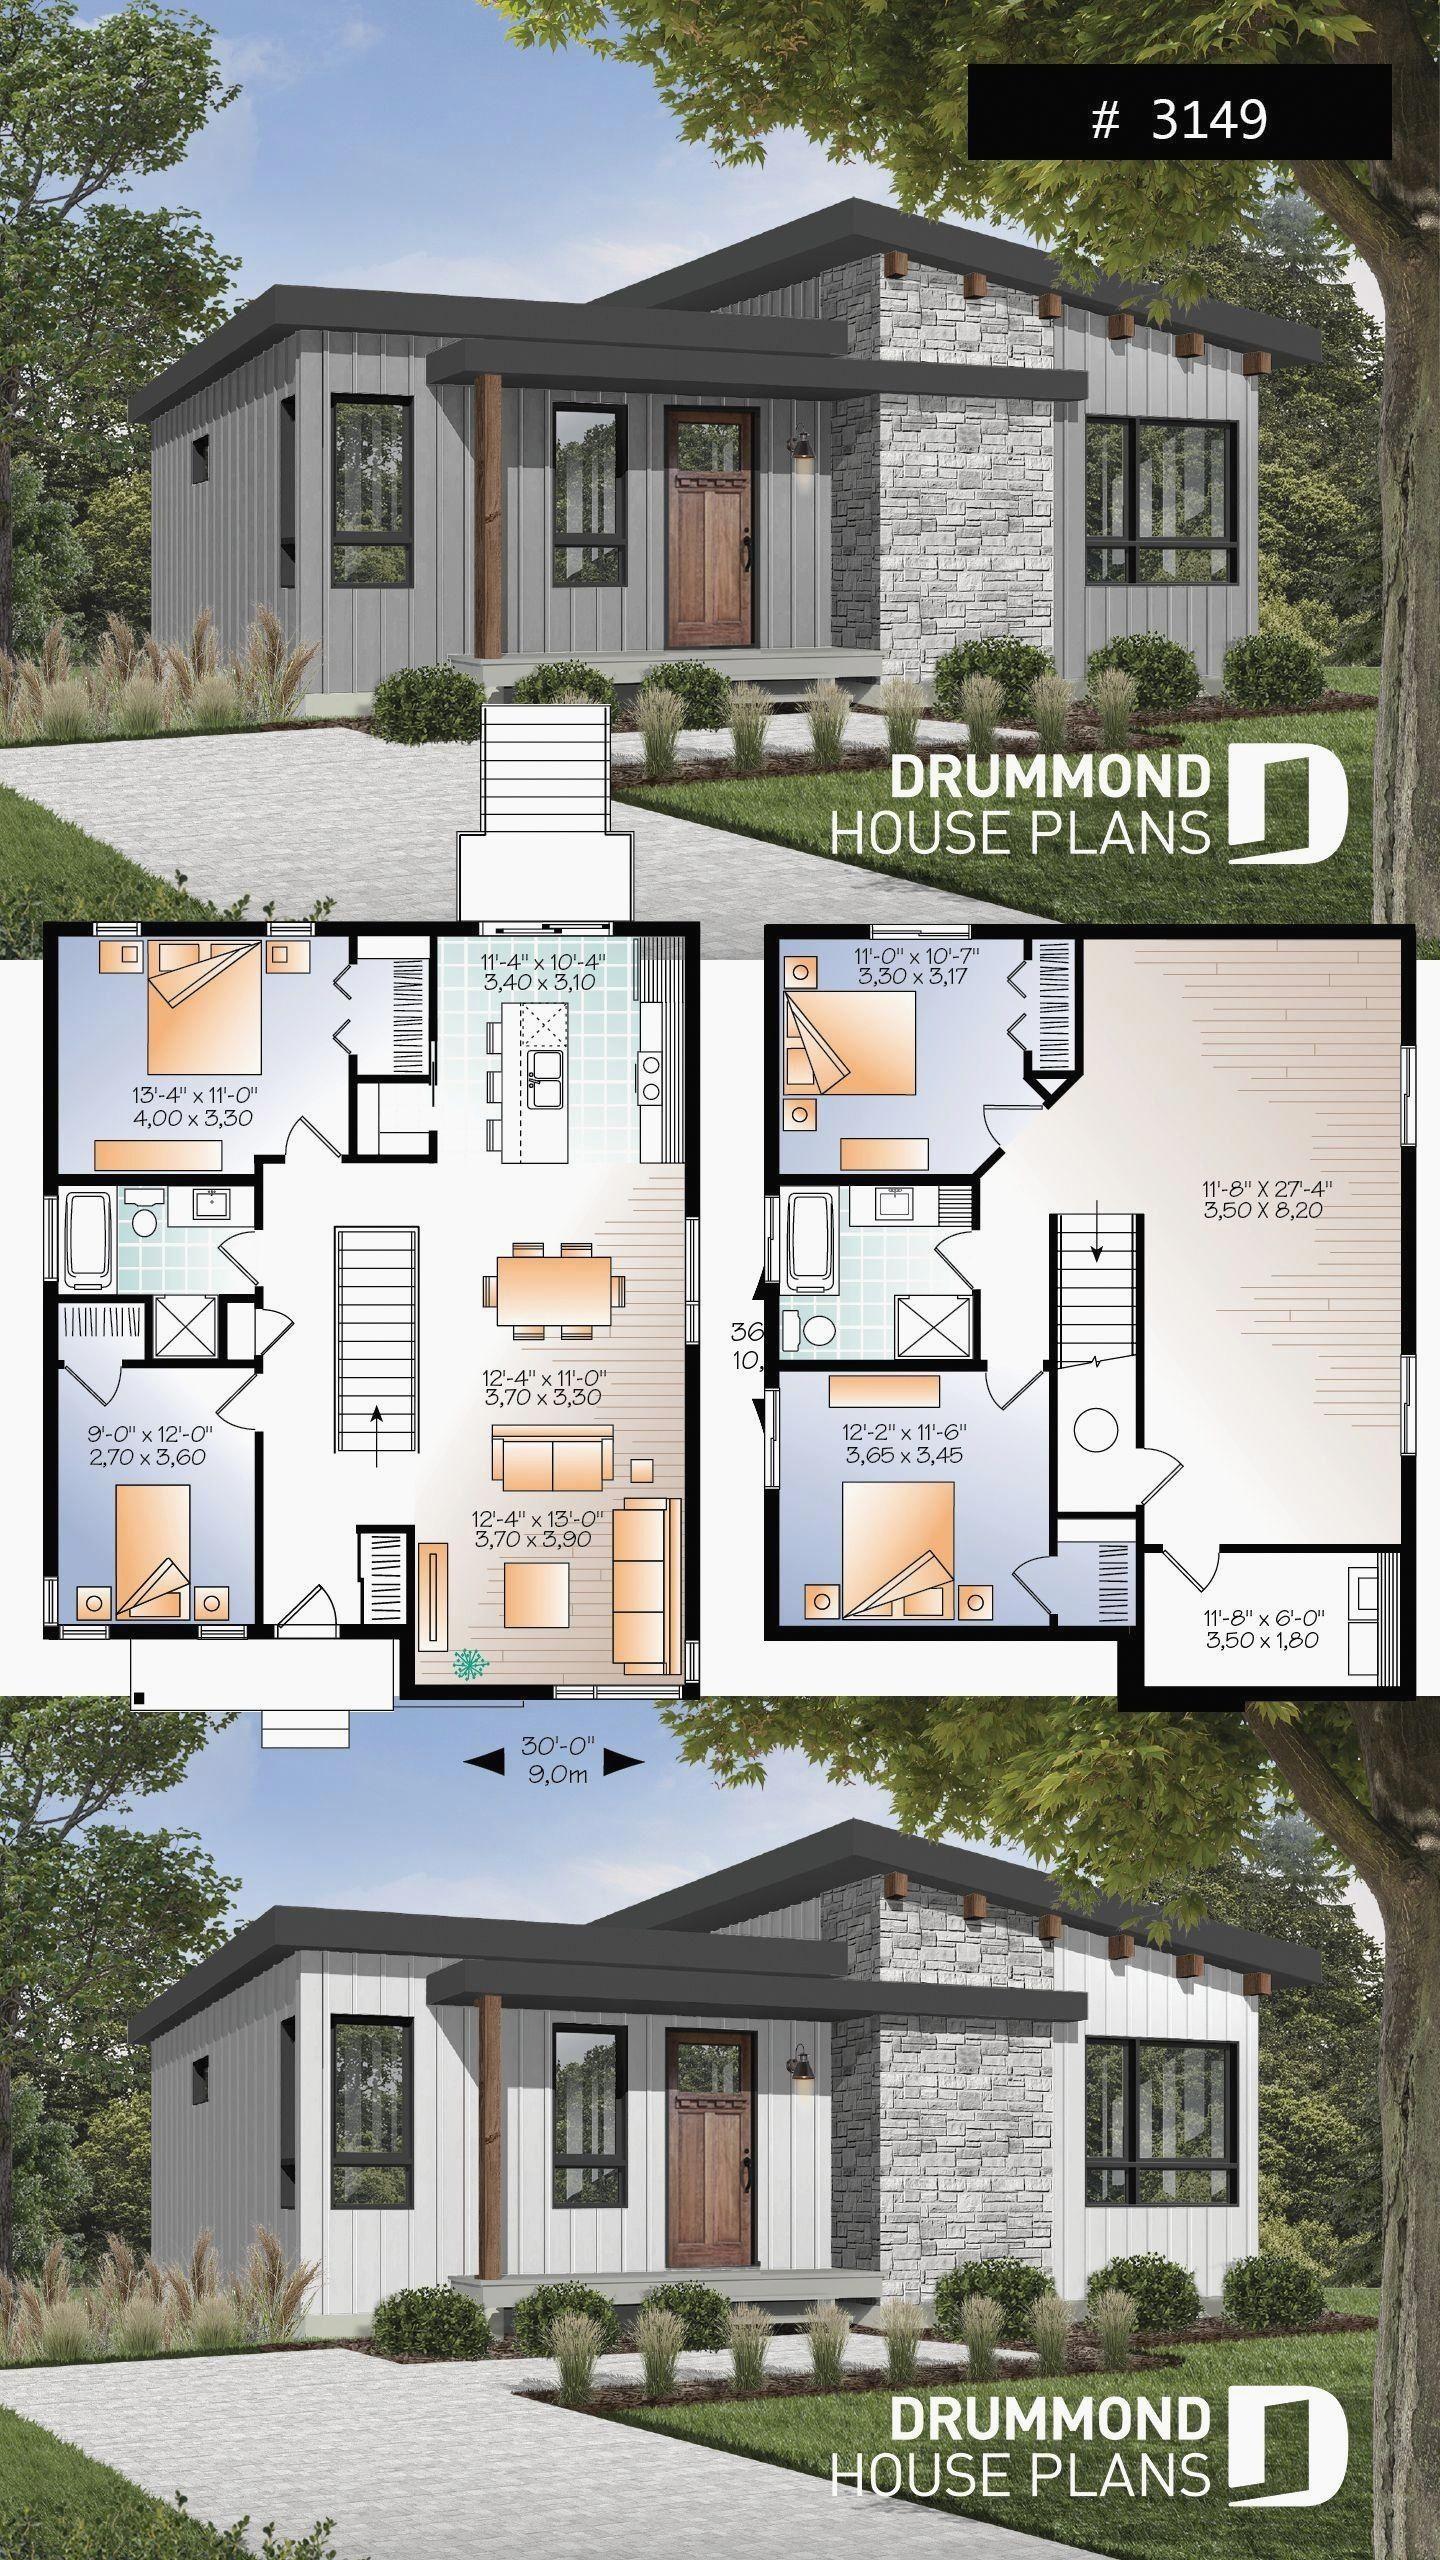 Erschwingliche Moderne Haus Planen Fertigen Keller Mit Insgesamt 4 Betten Familienzimmer Lk Speisekamm Sims House Plans House Plans Modern House Plan